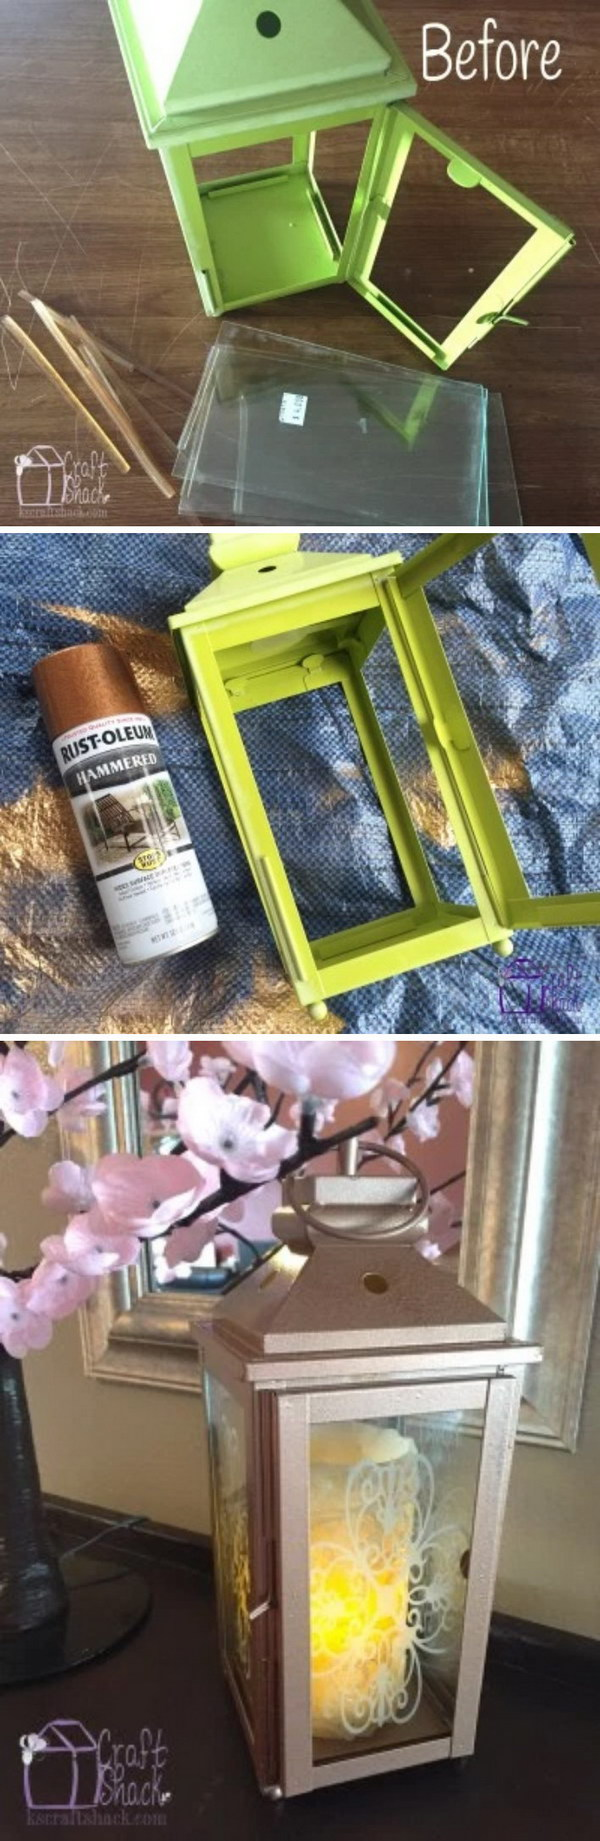 Thrift Store Lantern Makeover with Gold Spray.